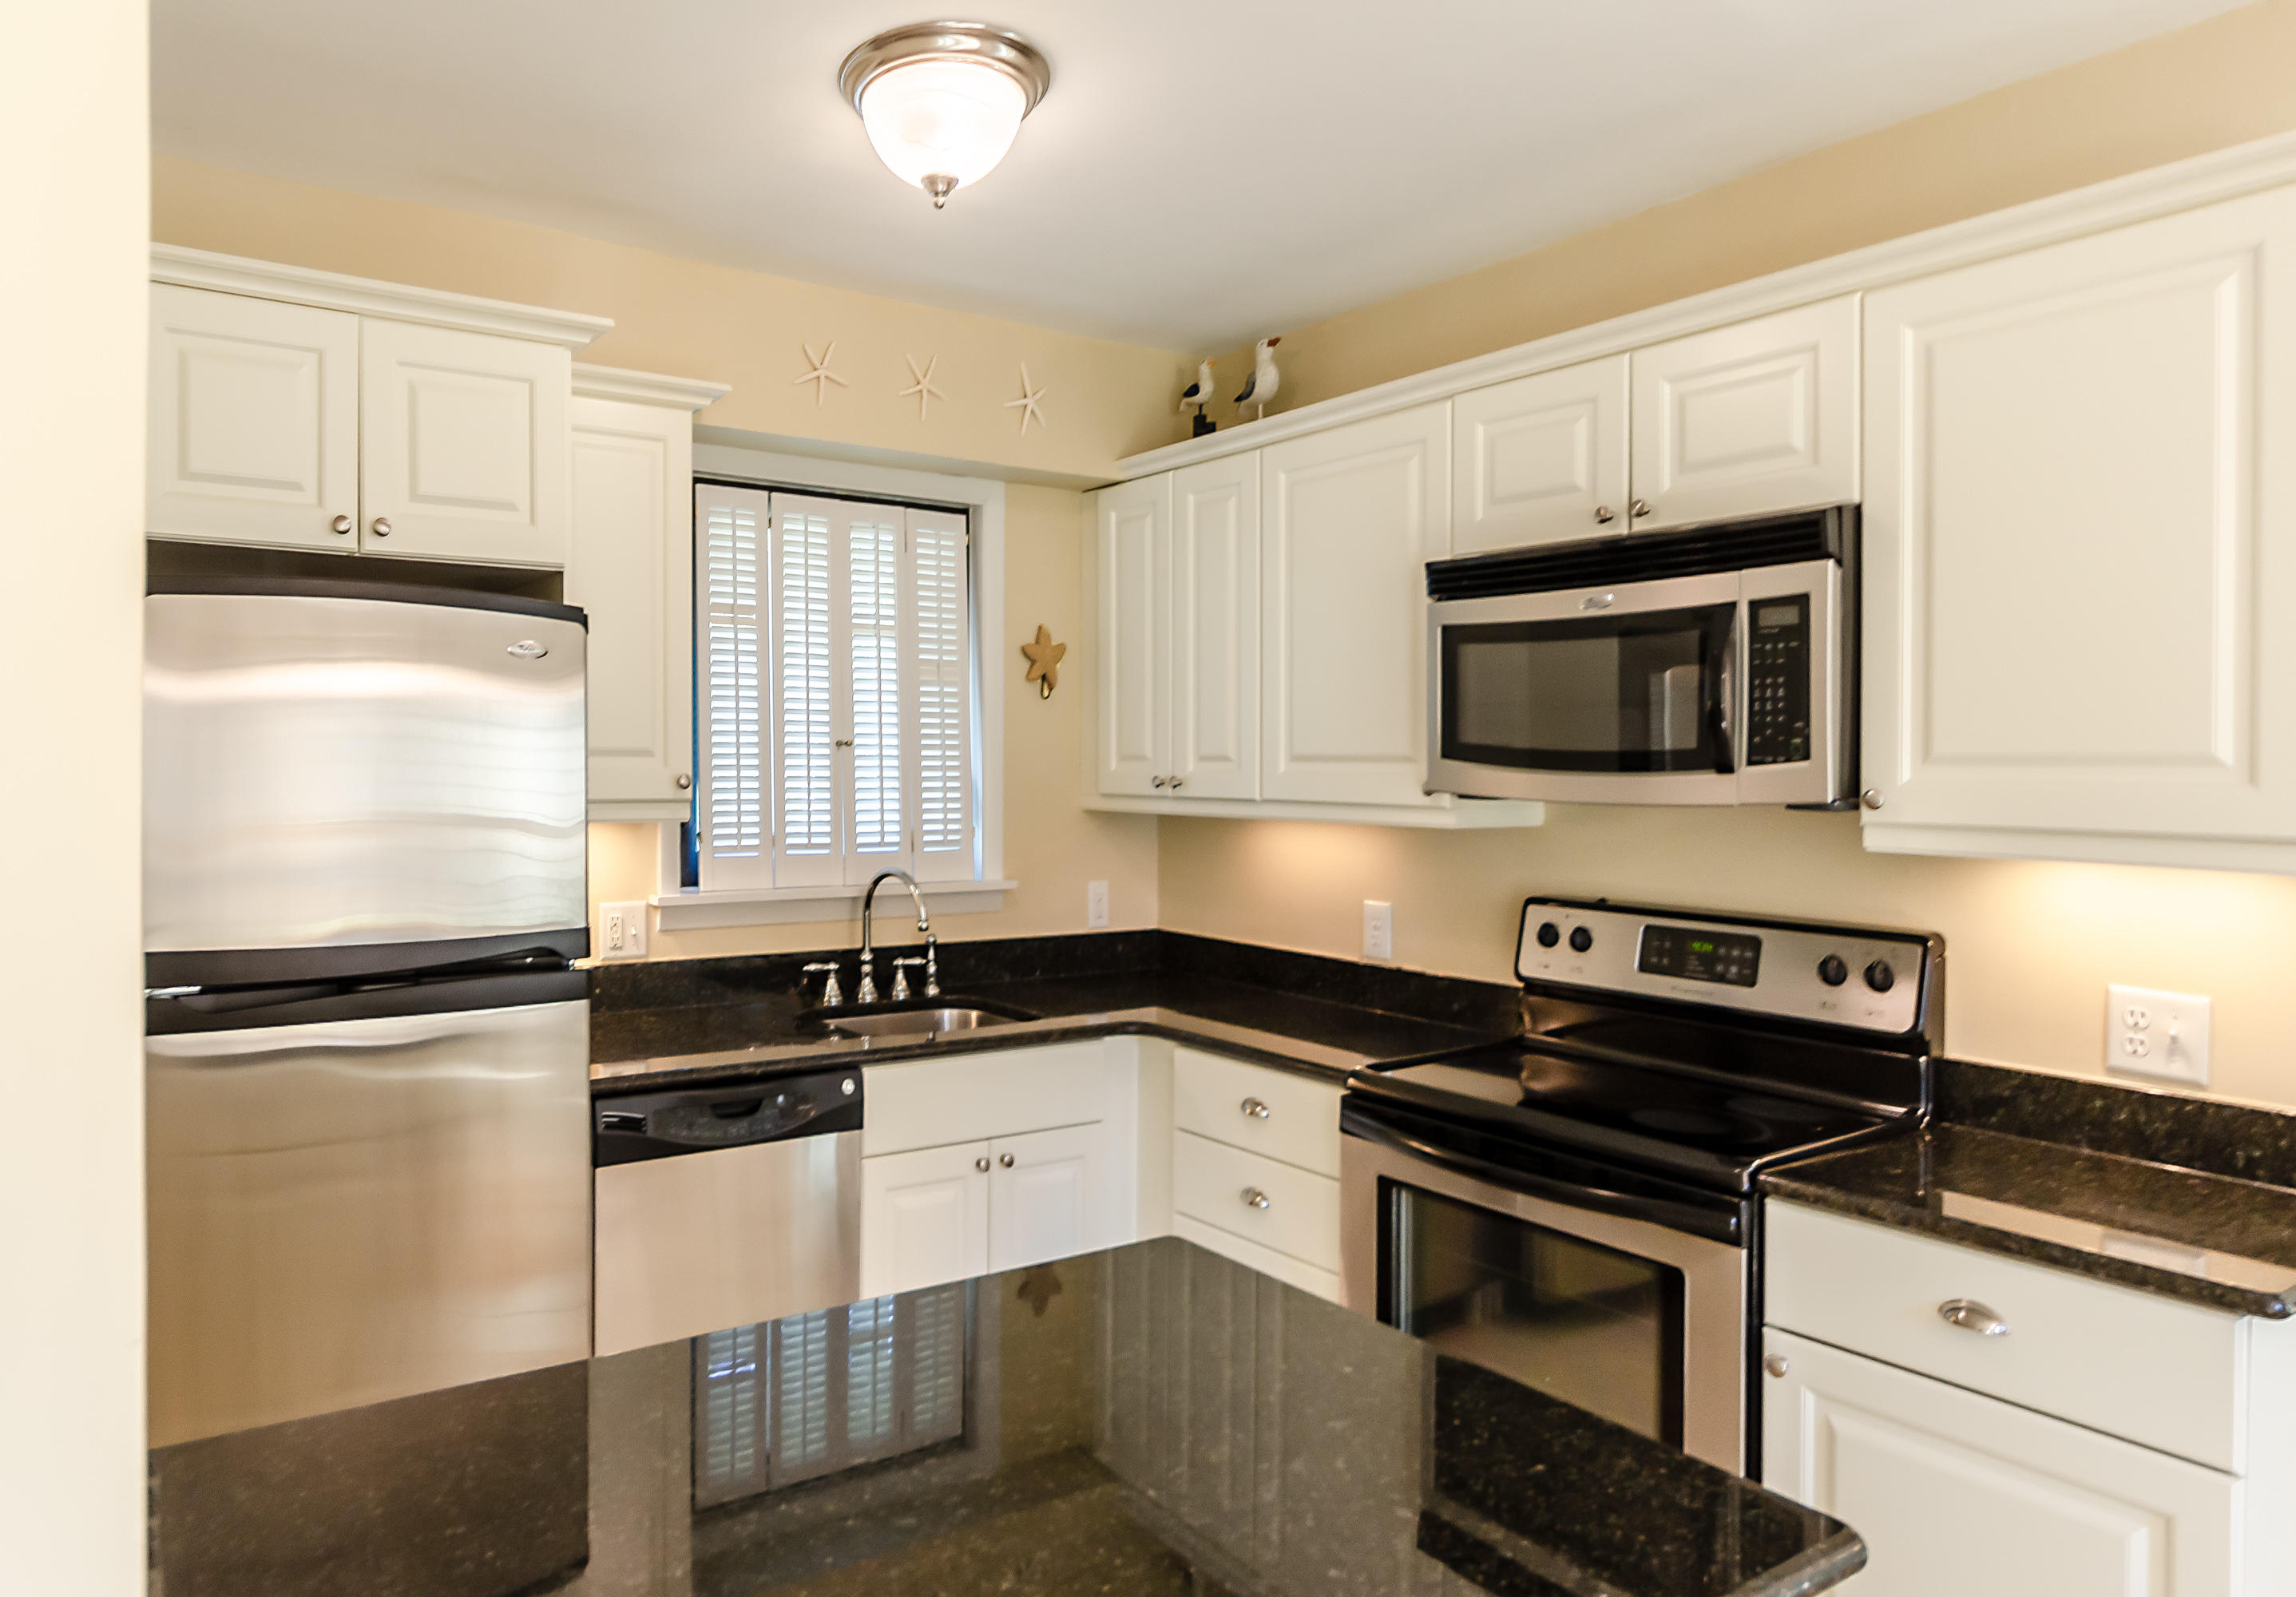 Seabrook Island Homes For Sale - 122 High Hammock Villa, Seabrook Island, SC - 19